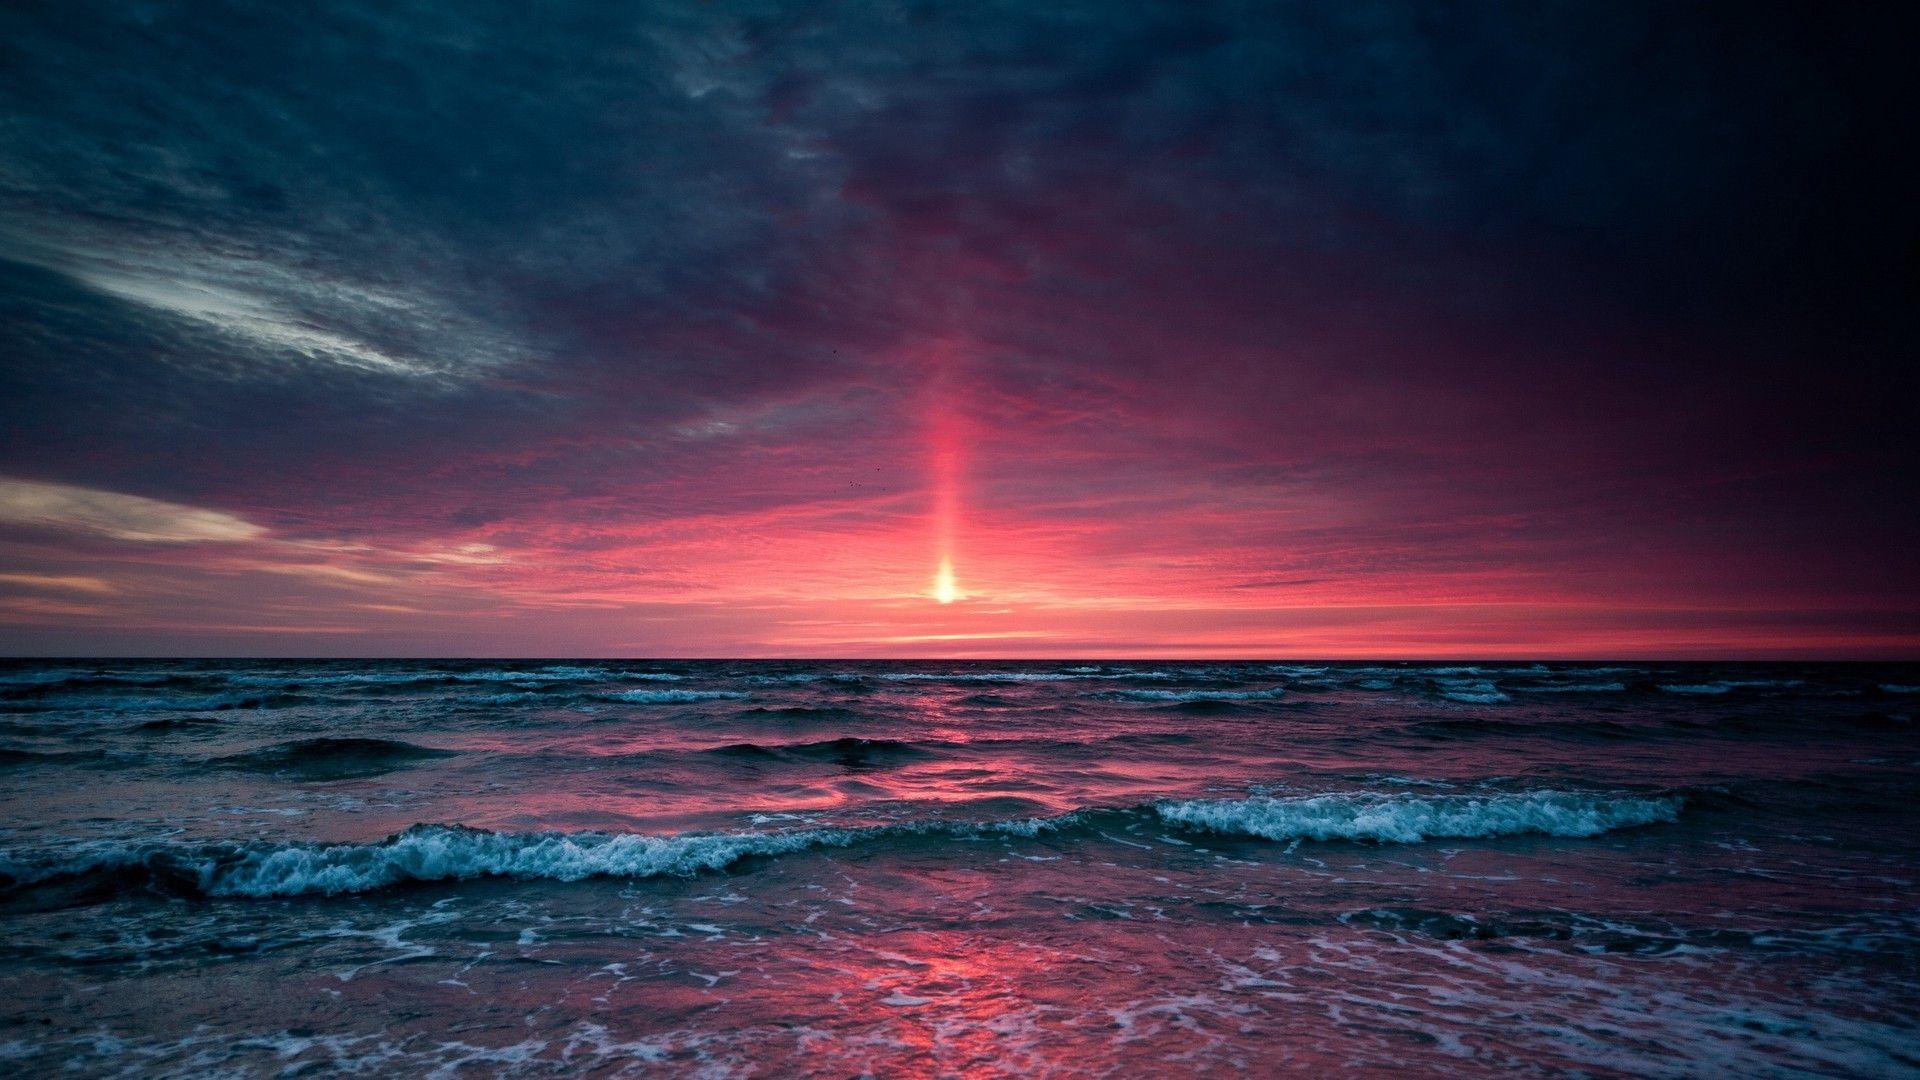 Ocean Pictures Downloads National Geographic Wallpaper Wp60010579 Live Wallpaper Hd Desktop Wallpapers Ocean Wallpaper Ocean Sunset Sunset Wallpaper